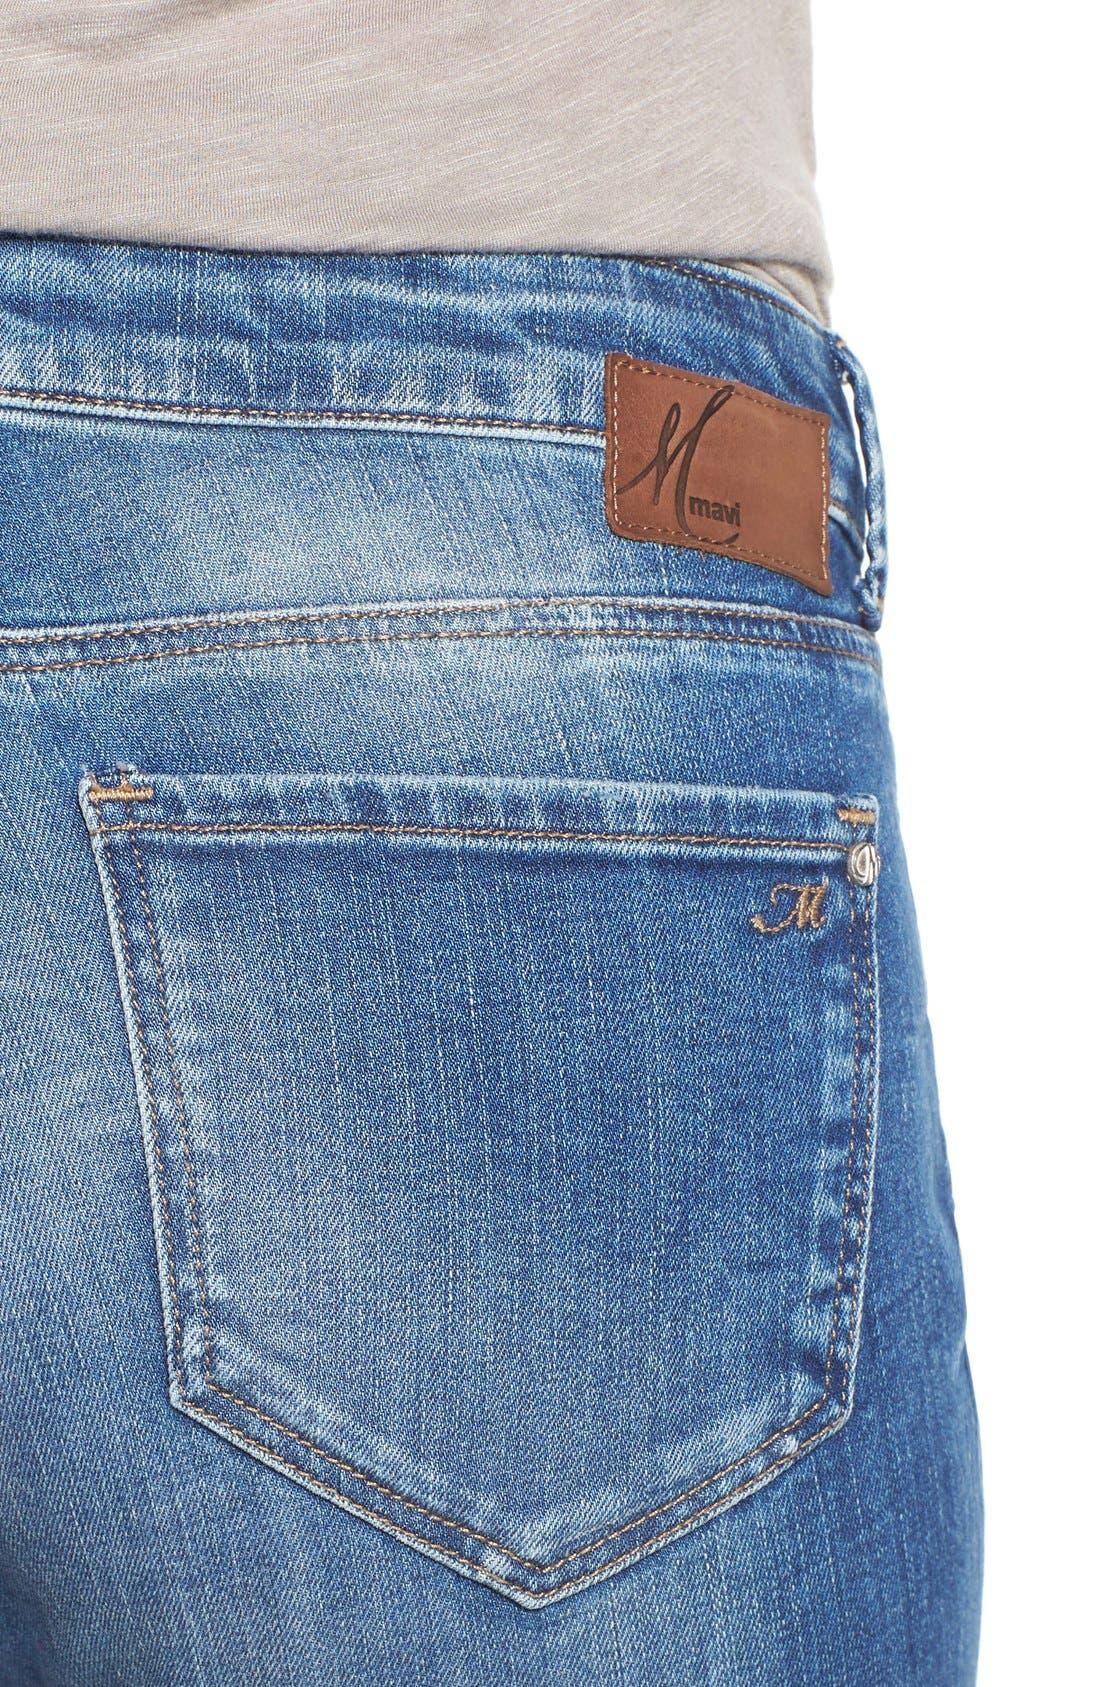 Alternate Image 4  - Mavi Jeans 'Emma' Stretch Slim Boyfriend Jeans (Shaded Vintage)